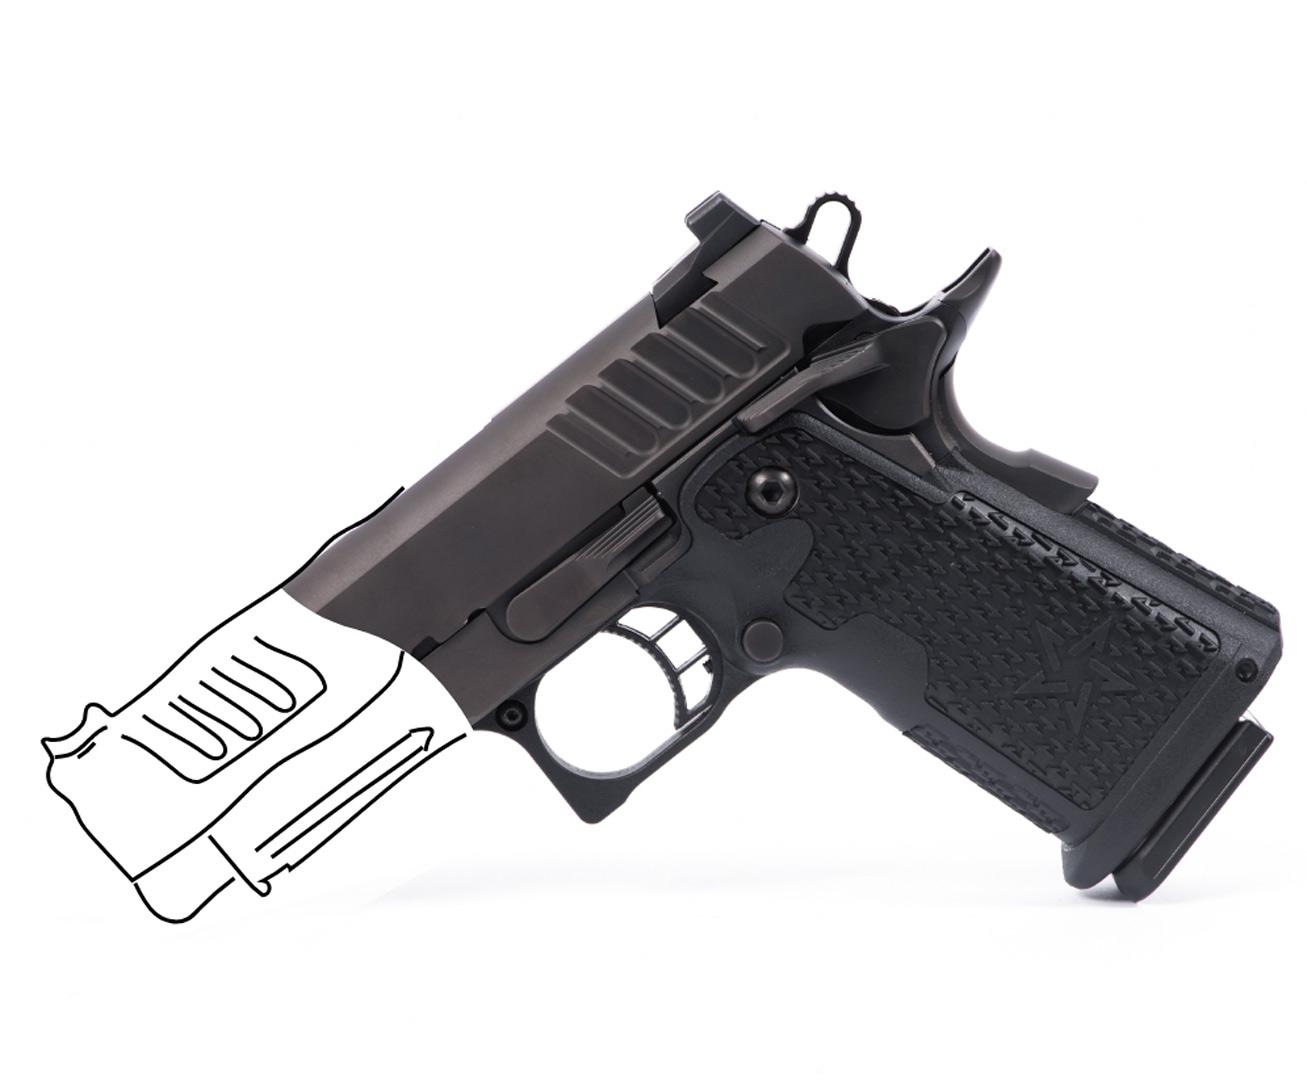 Staccato handgun with line art replacing the barrel